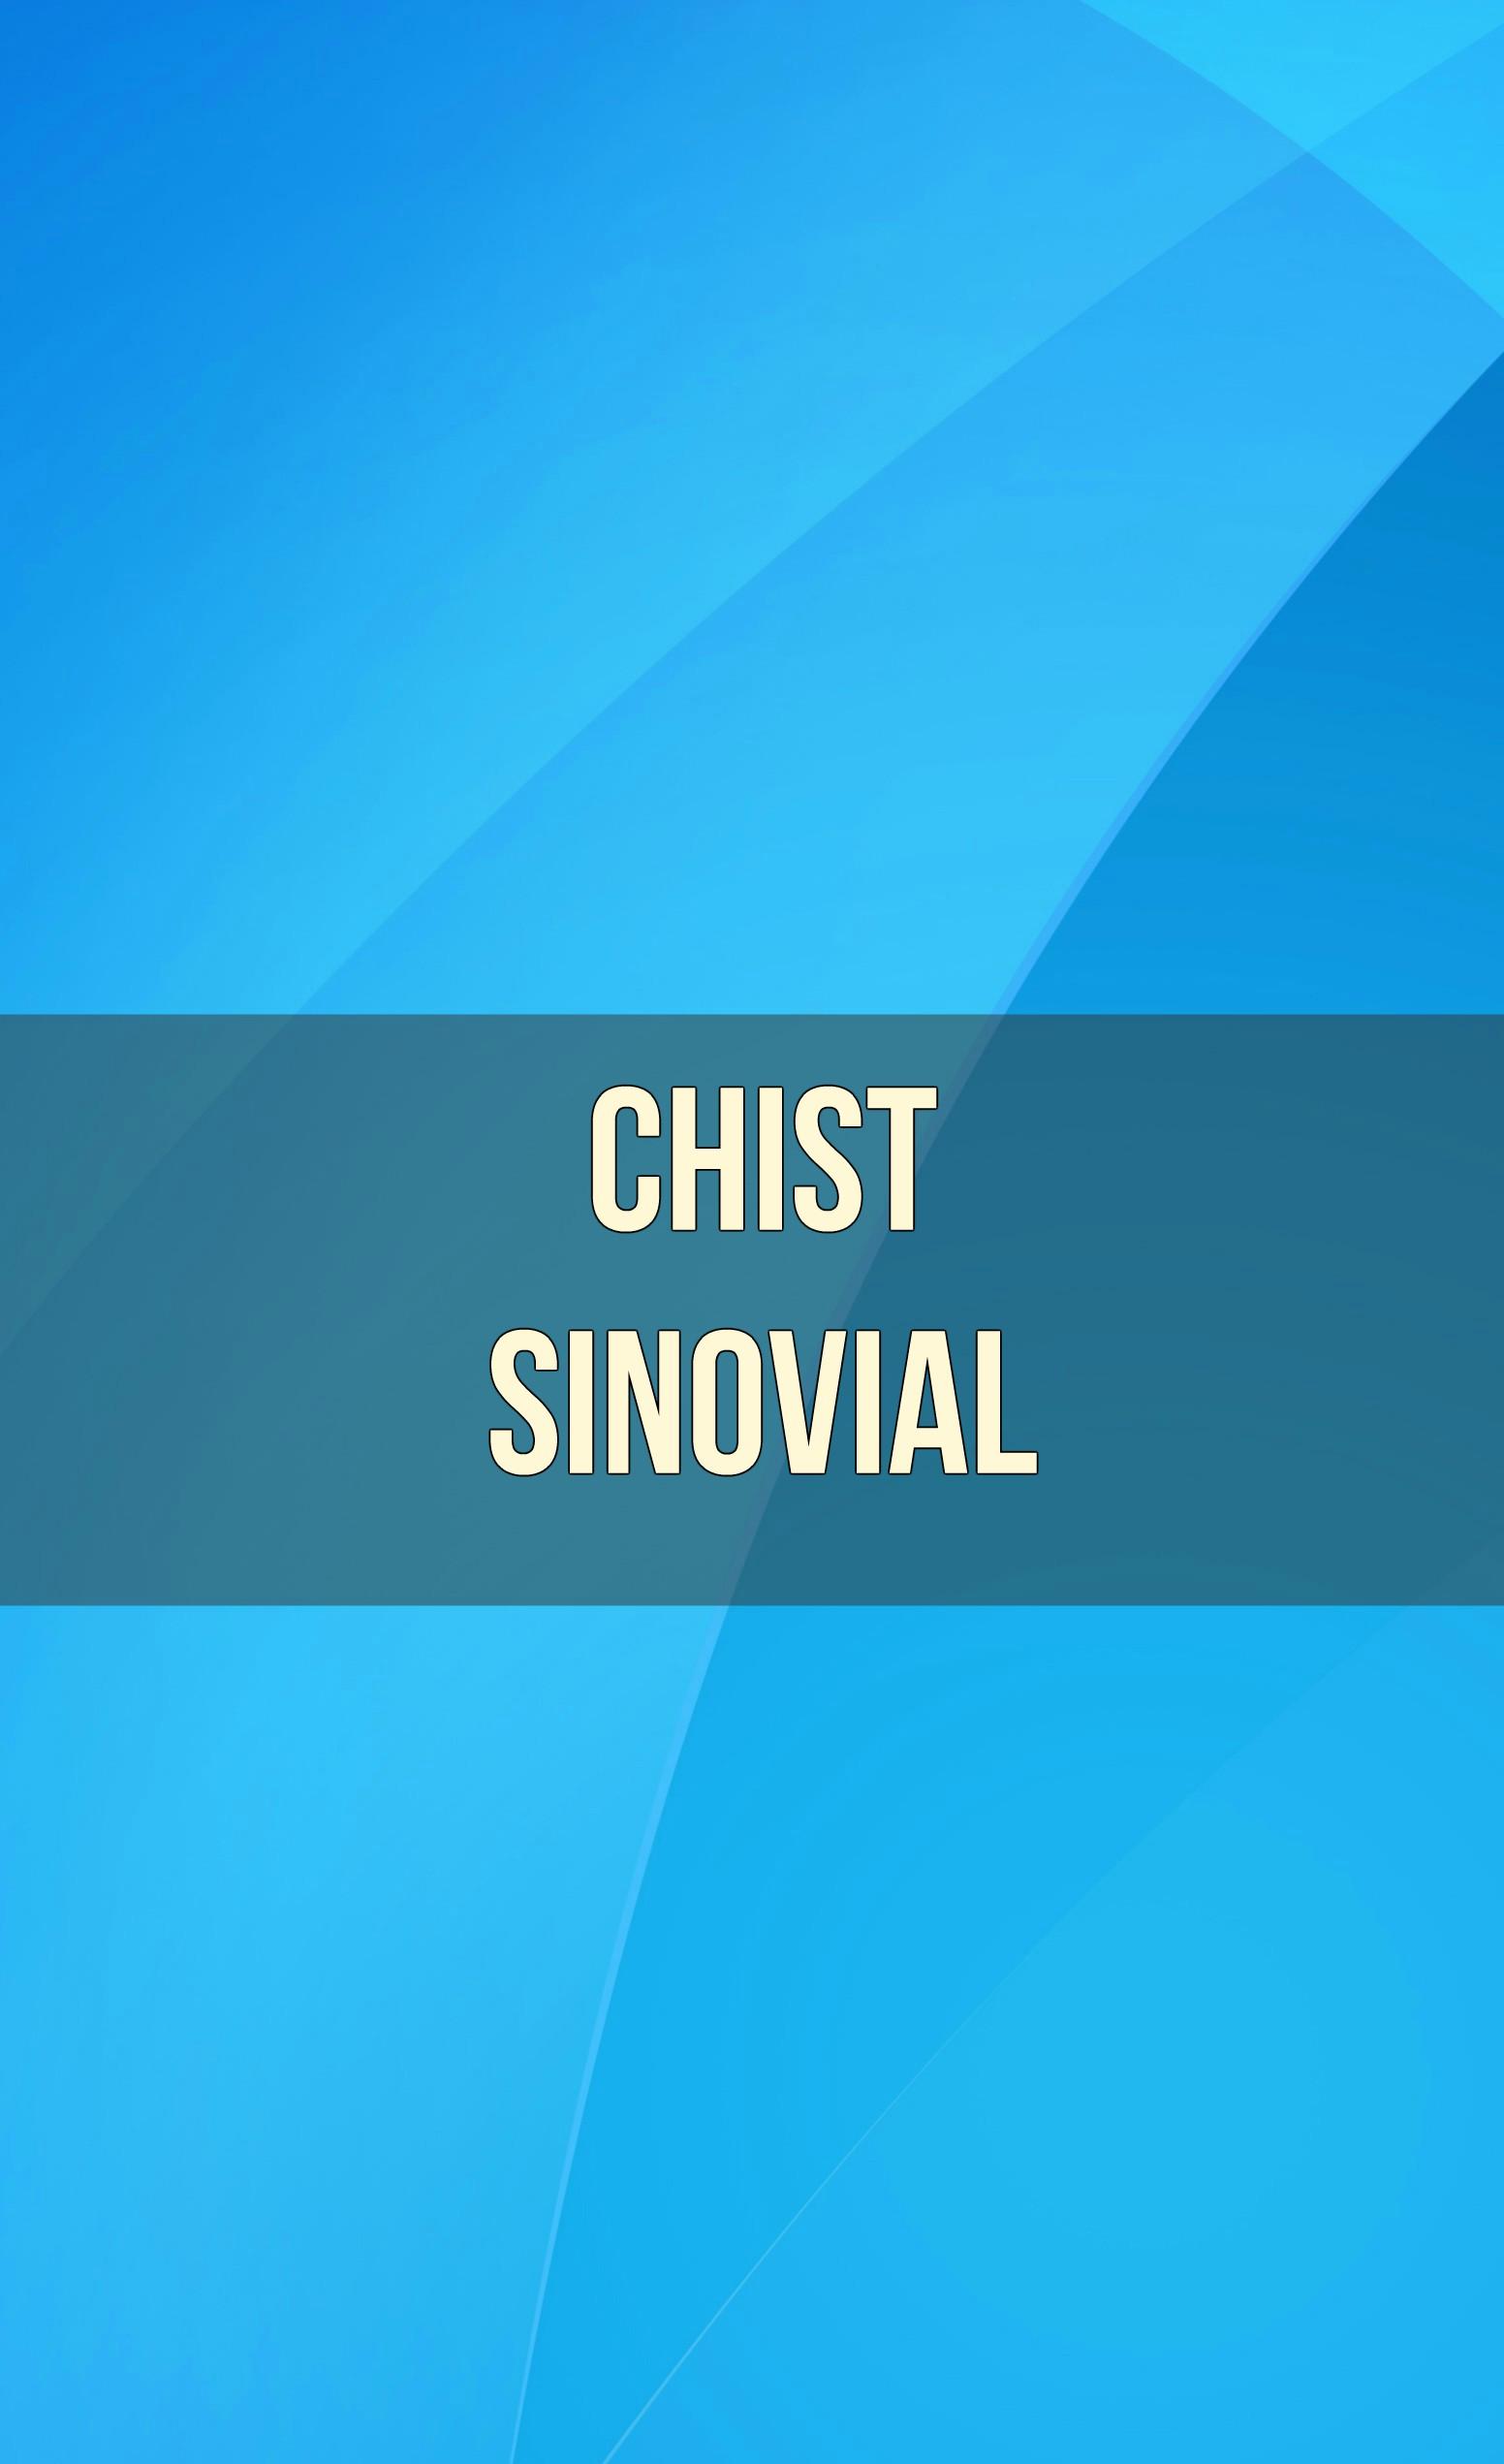 chist sinovial